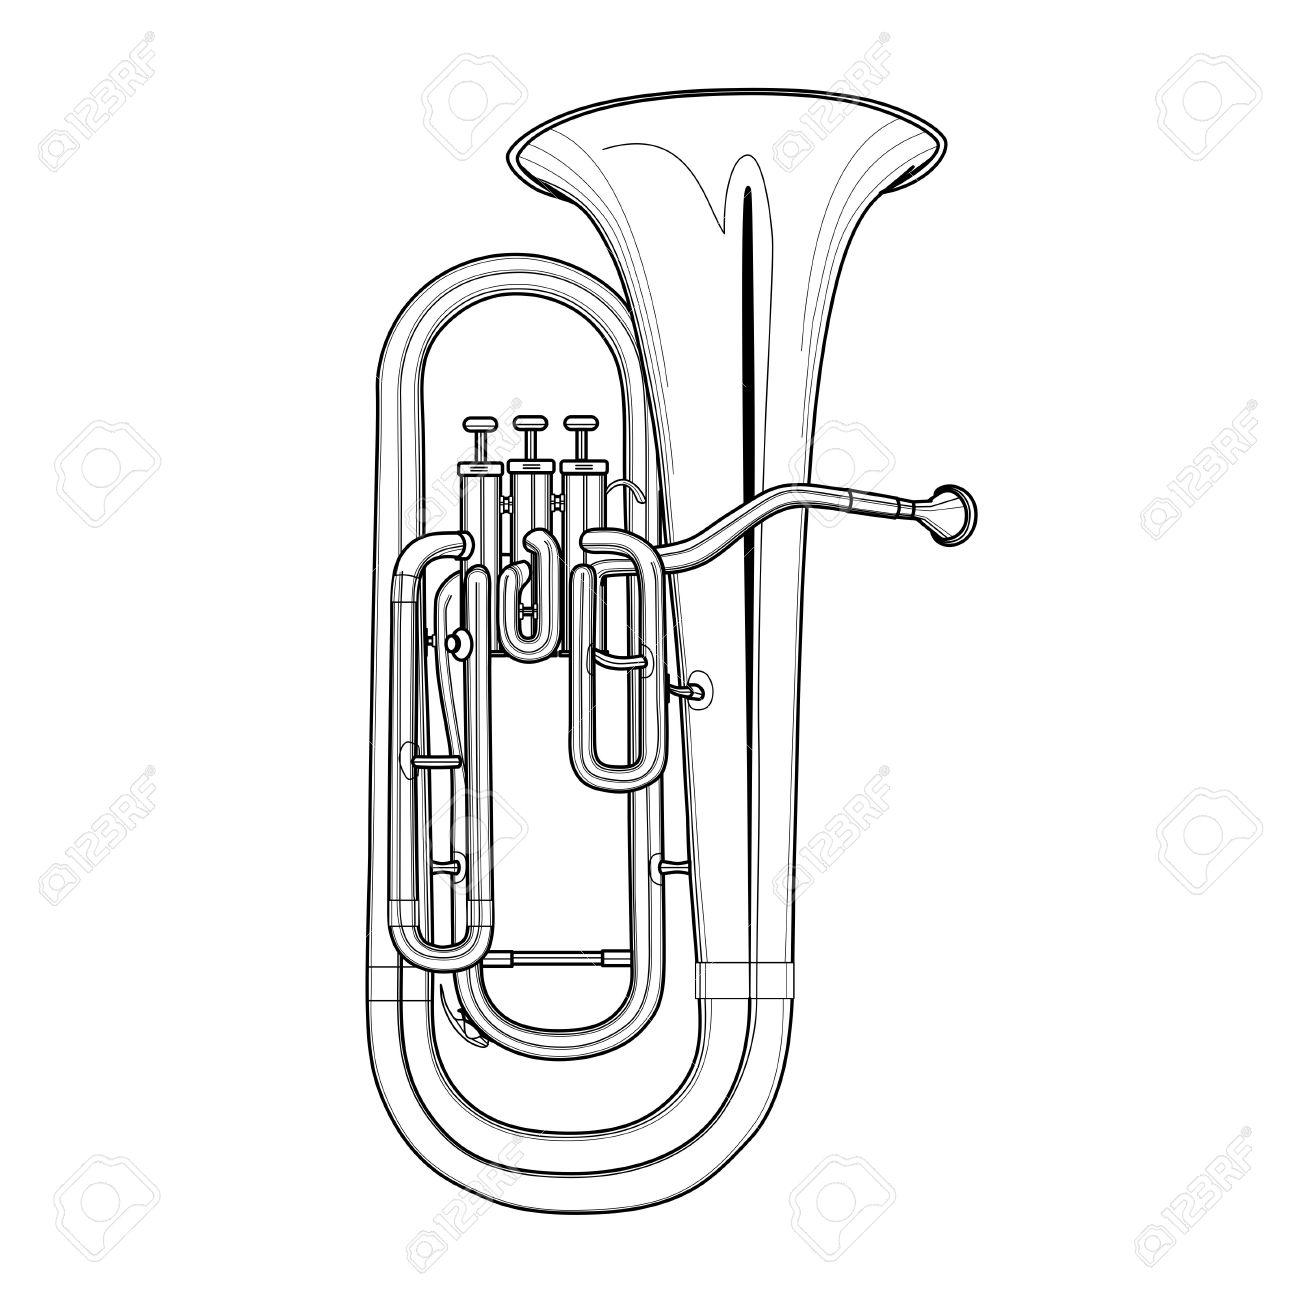 hight resolution of 1300x1300 tuba clipart euphonium frames illustrations hd images tuba sketch